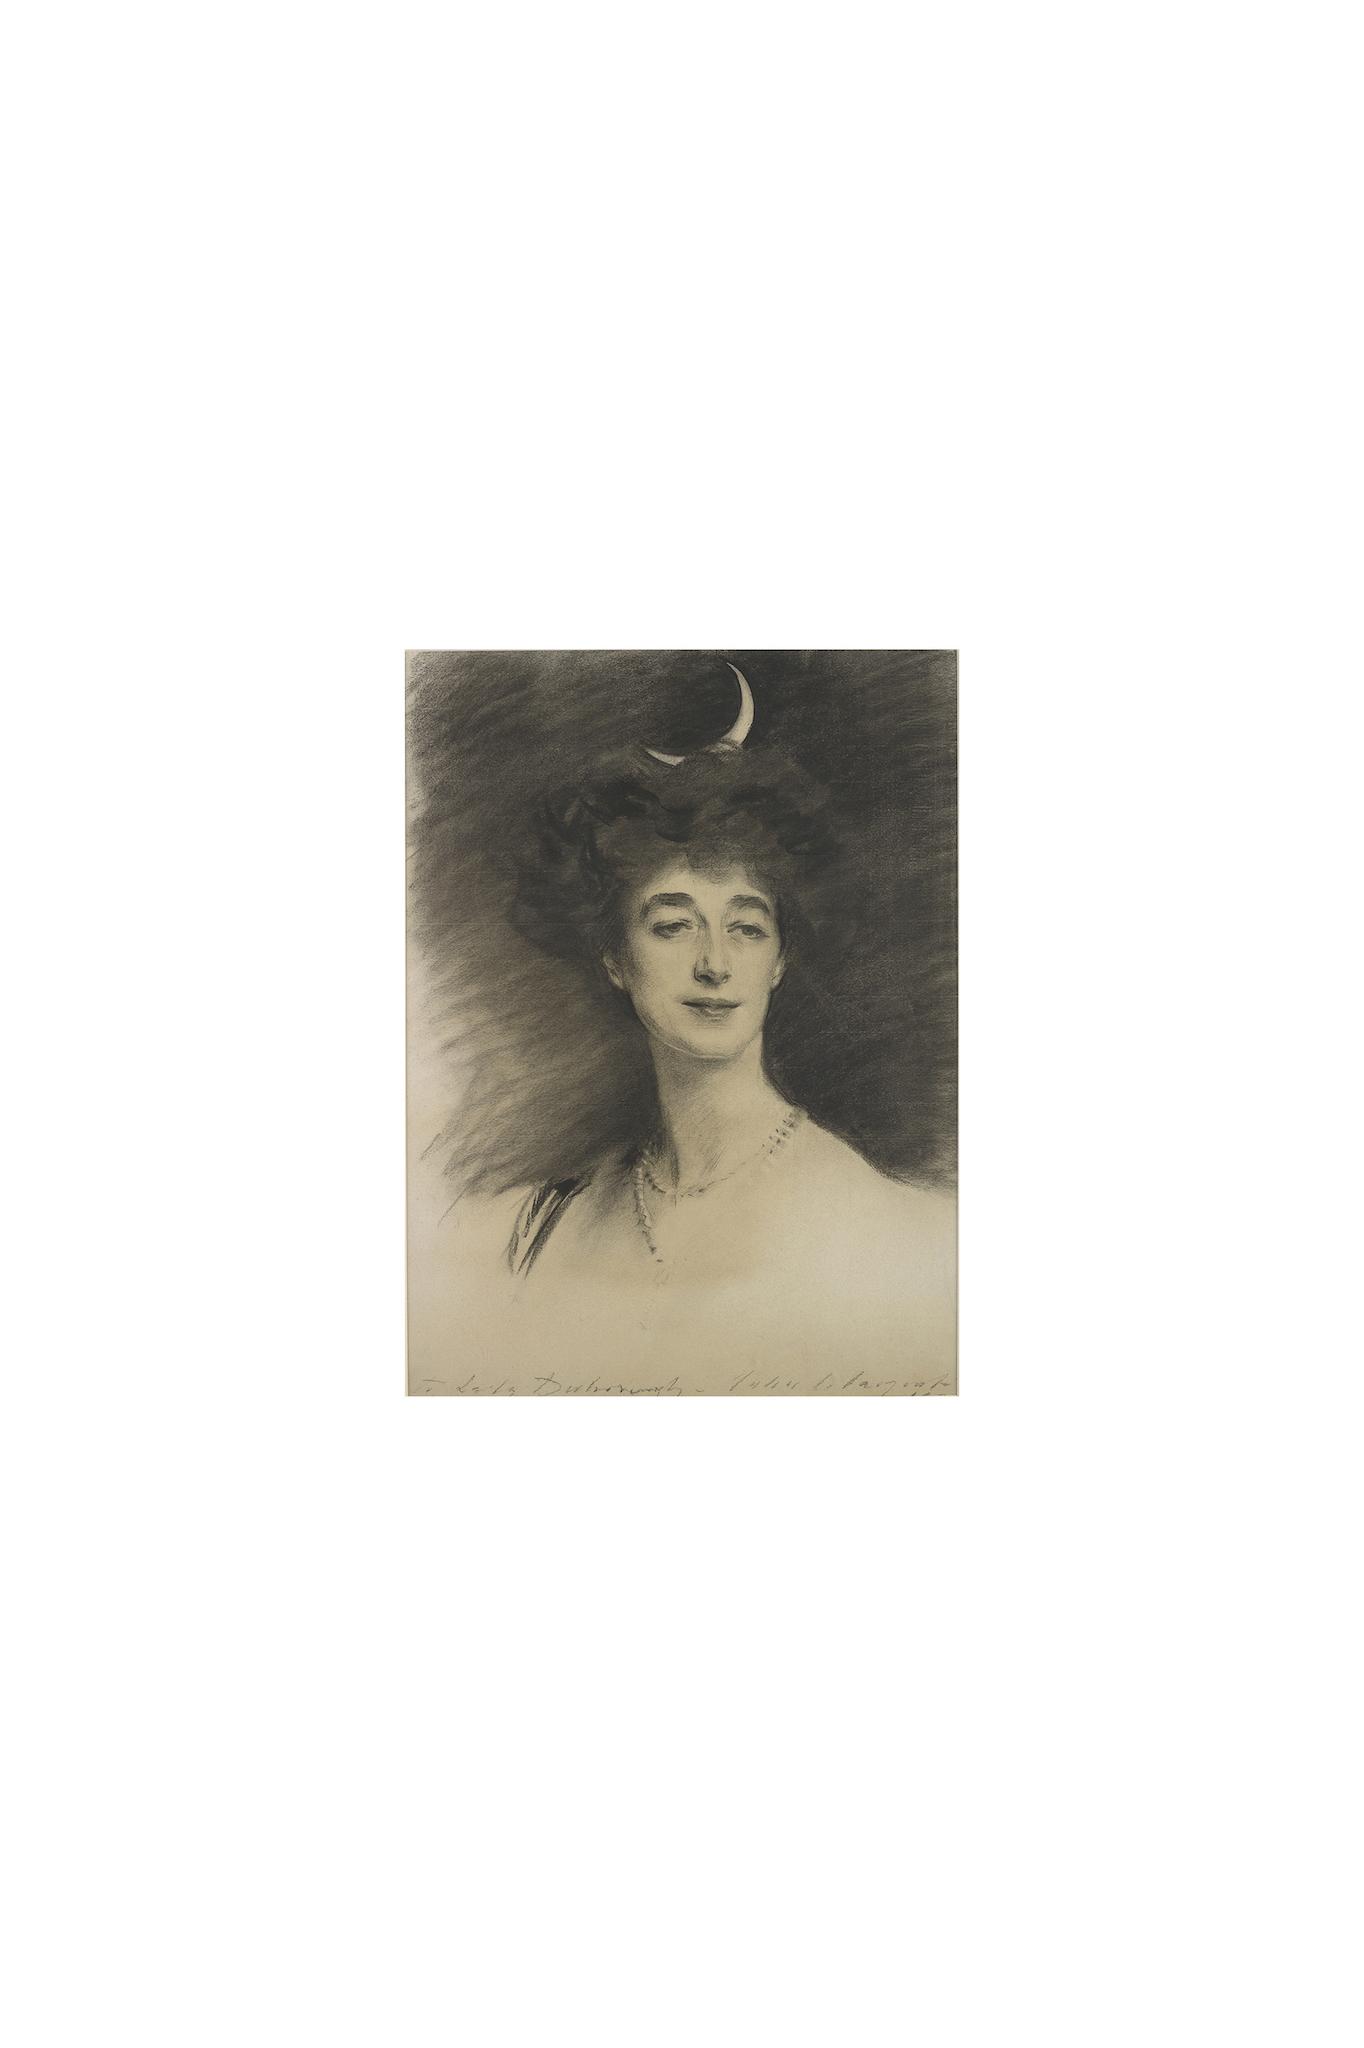 John Singer Sargent, Ethel Grenfell, Lady Desborough, 1909